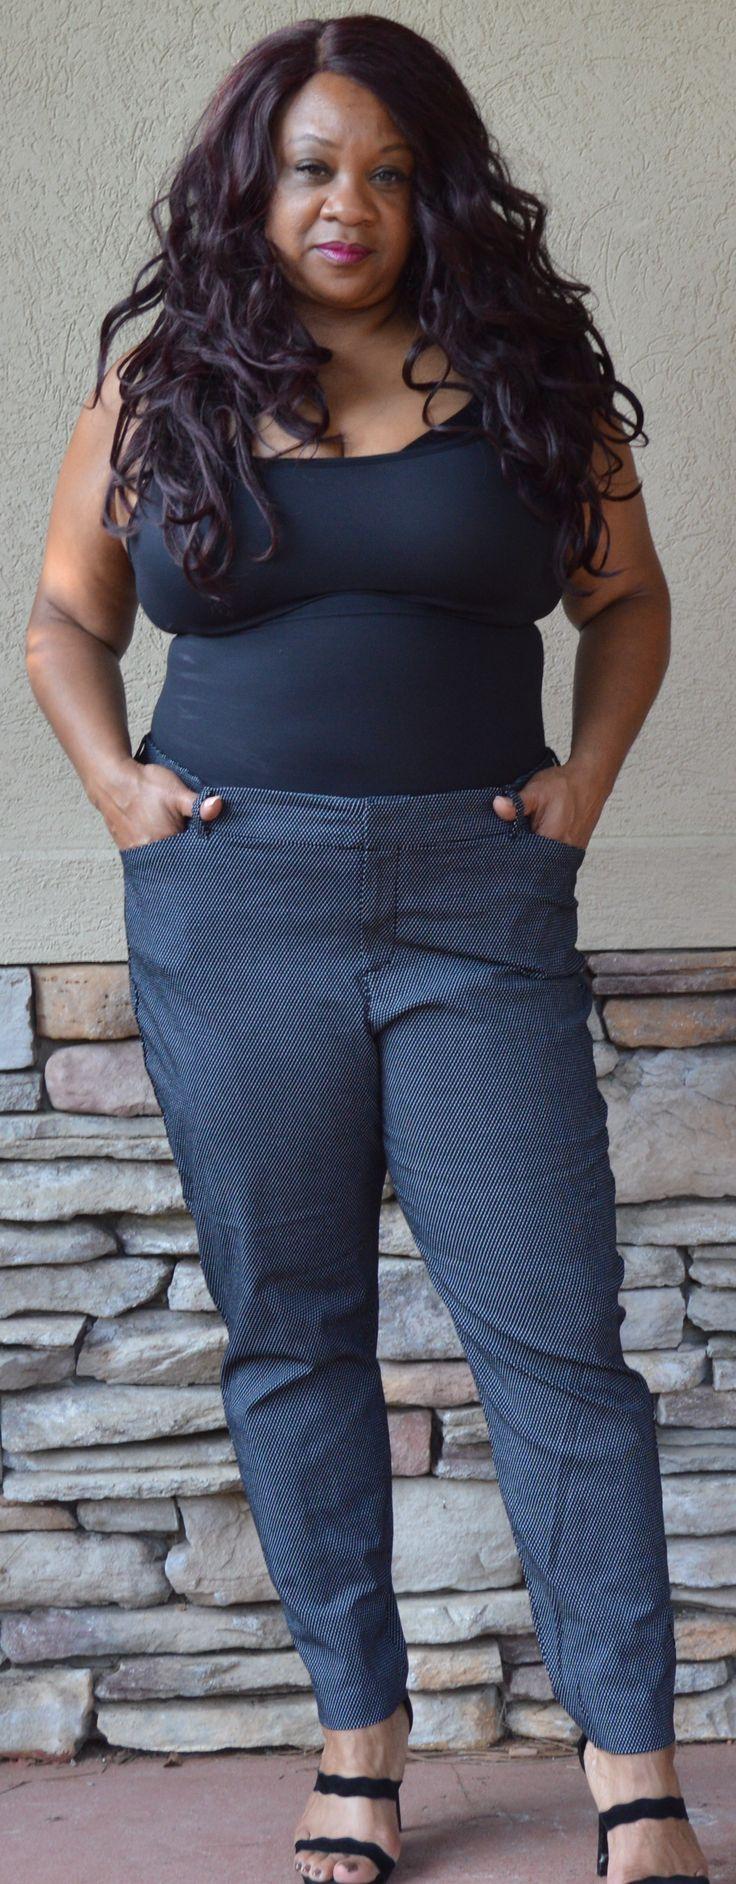 #OldNavy Black and White Pixie Stitch Design Pants Size 20 Regular #Plussize #plussizefashion